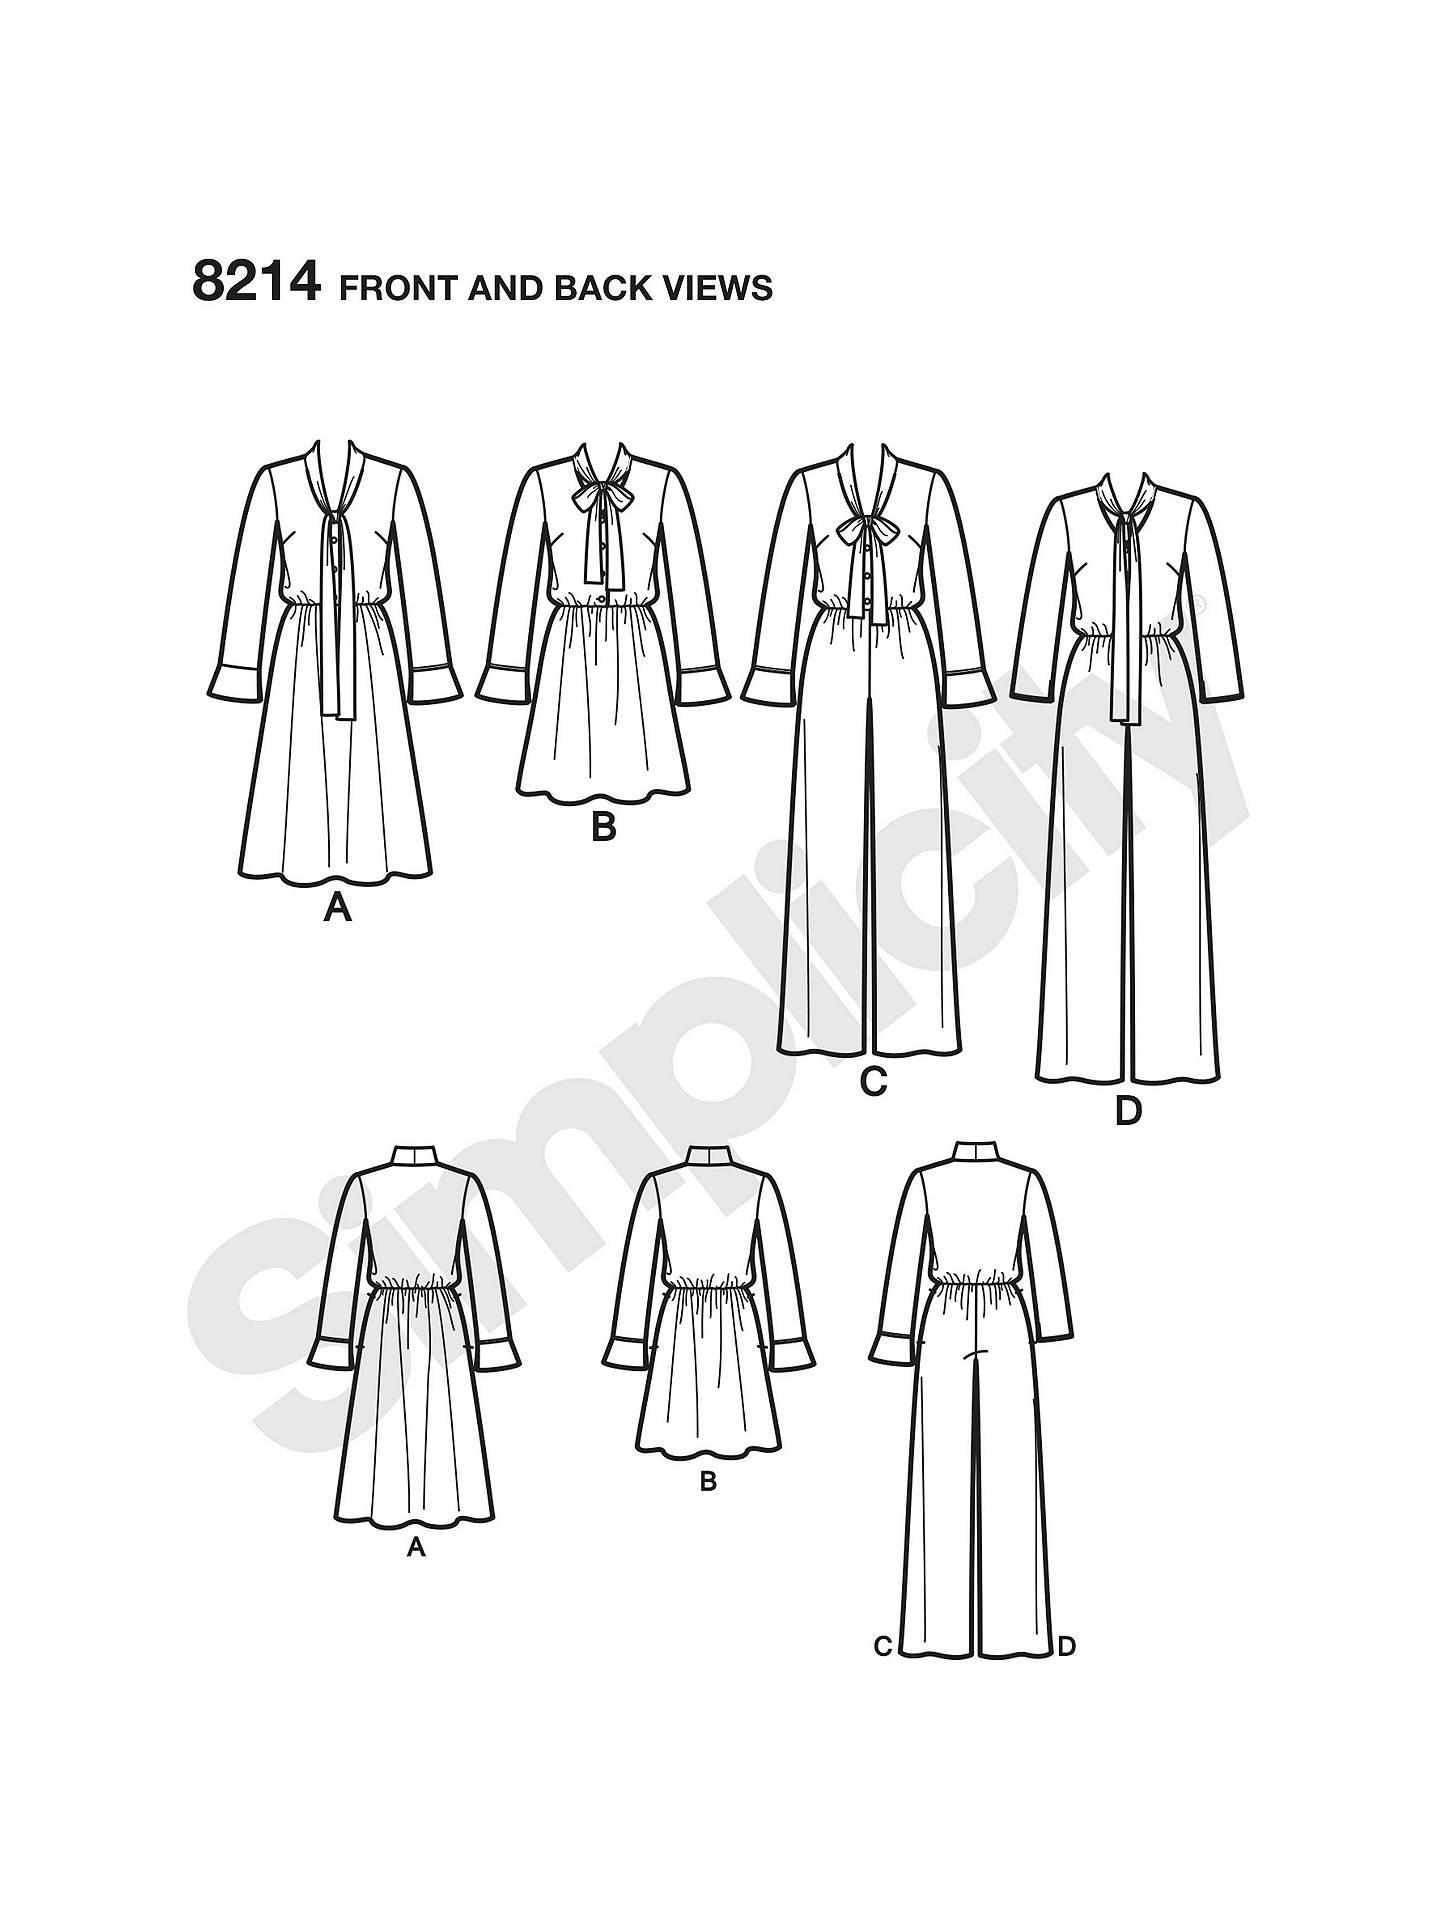 Simplicity Women\'s Dresses Sewing Pattern, 8214 at John Lewis & Partners